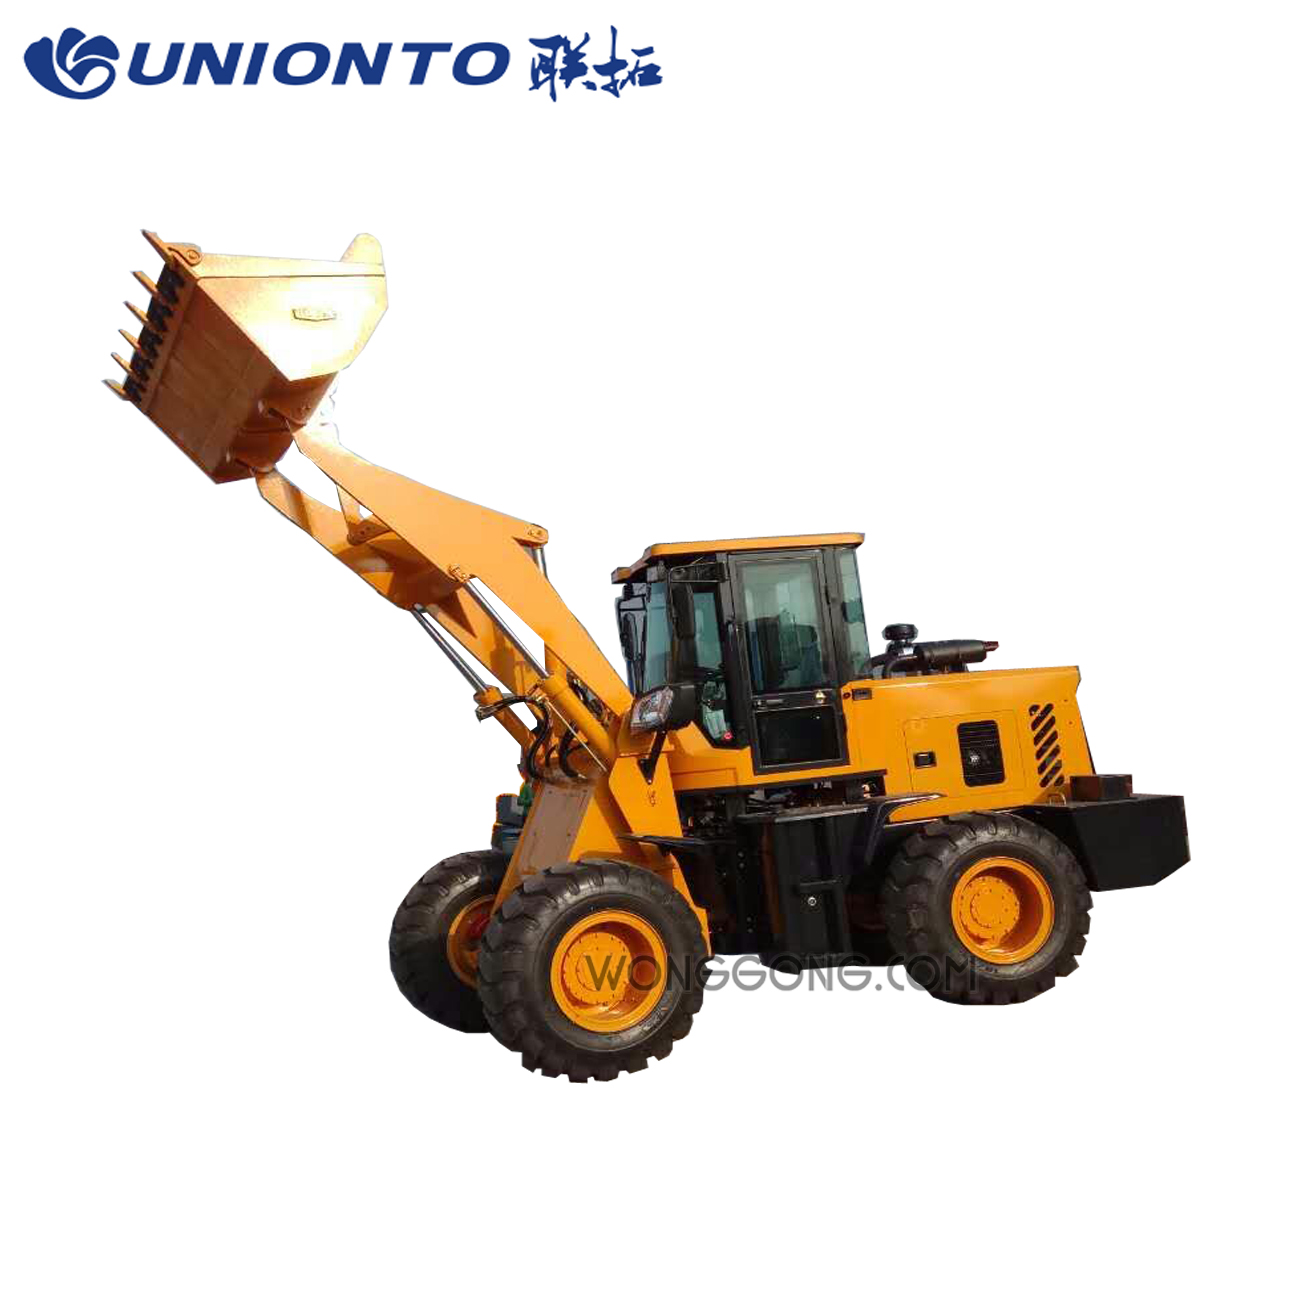 UNIONTO-915 mini loader for sale